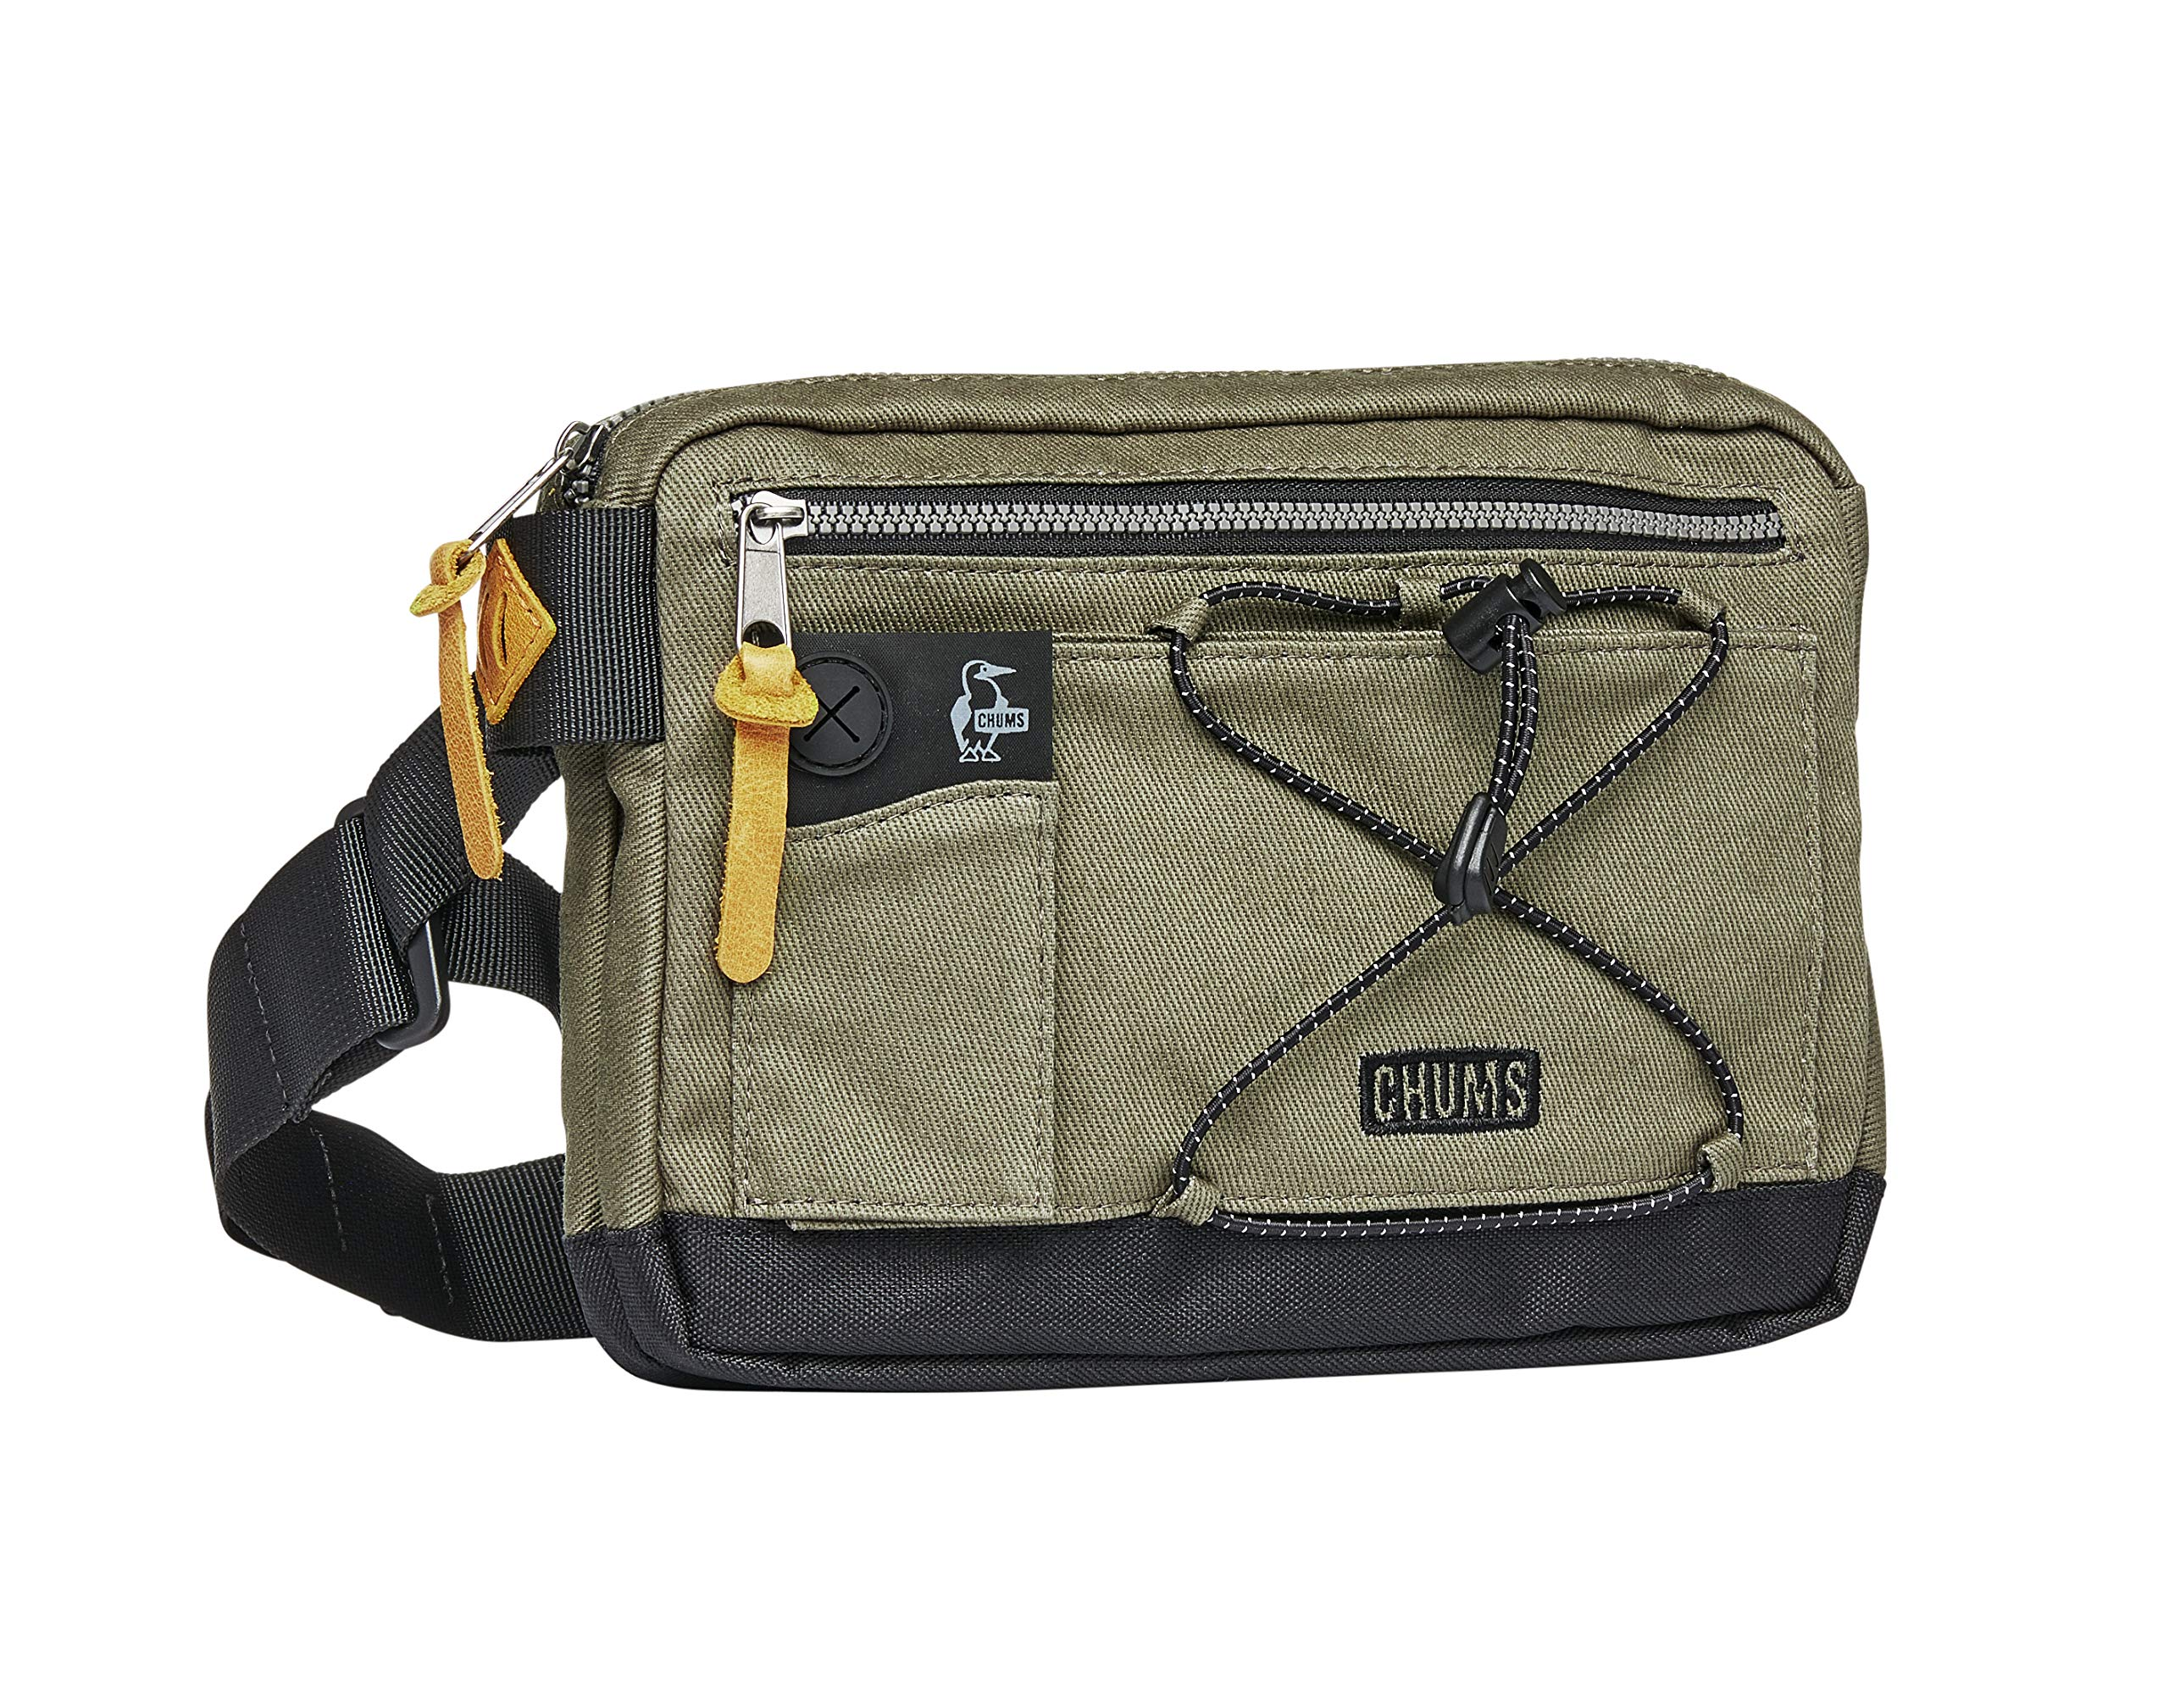 Chums Scrambler Reflective Waist Pack Shoulder Bag, Green/Black, One Size by Chums